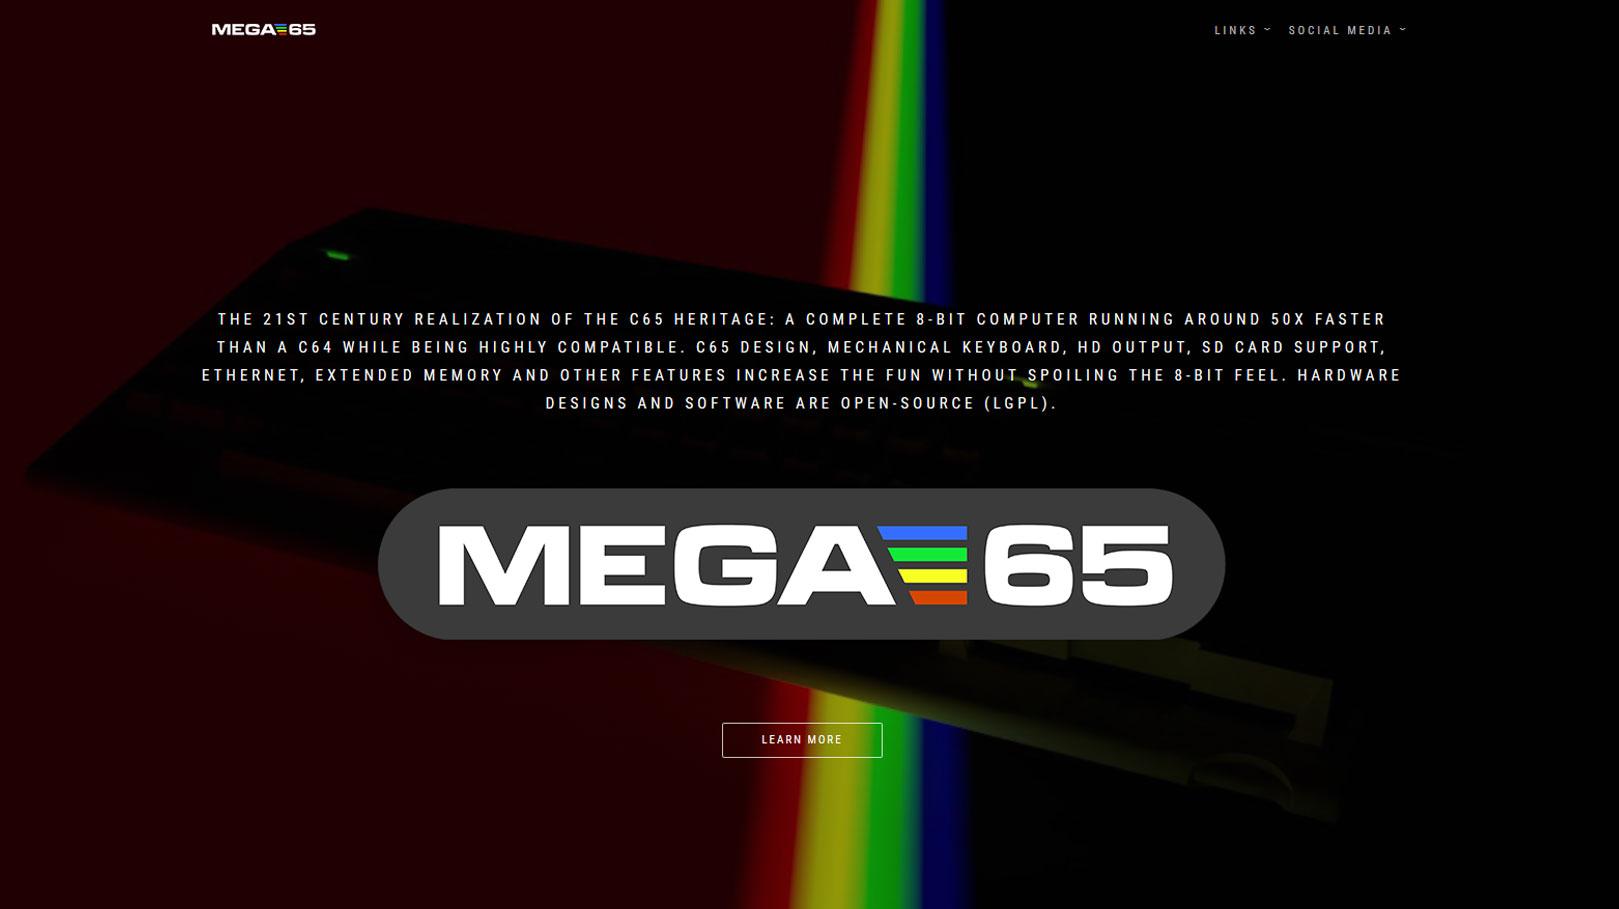 MEGA - Museum of Electronic Games & Art